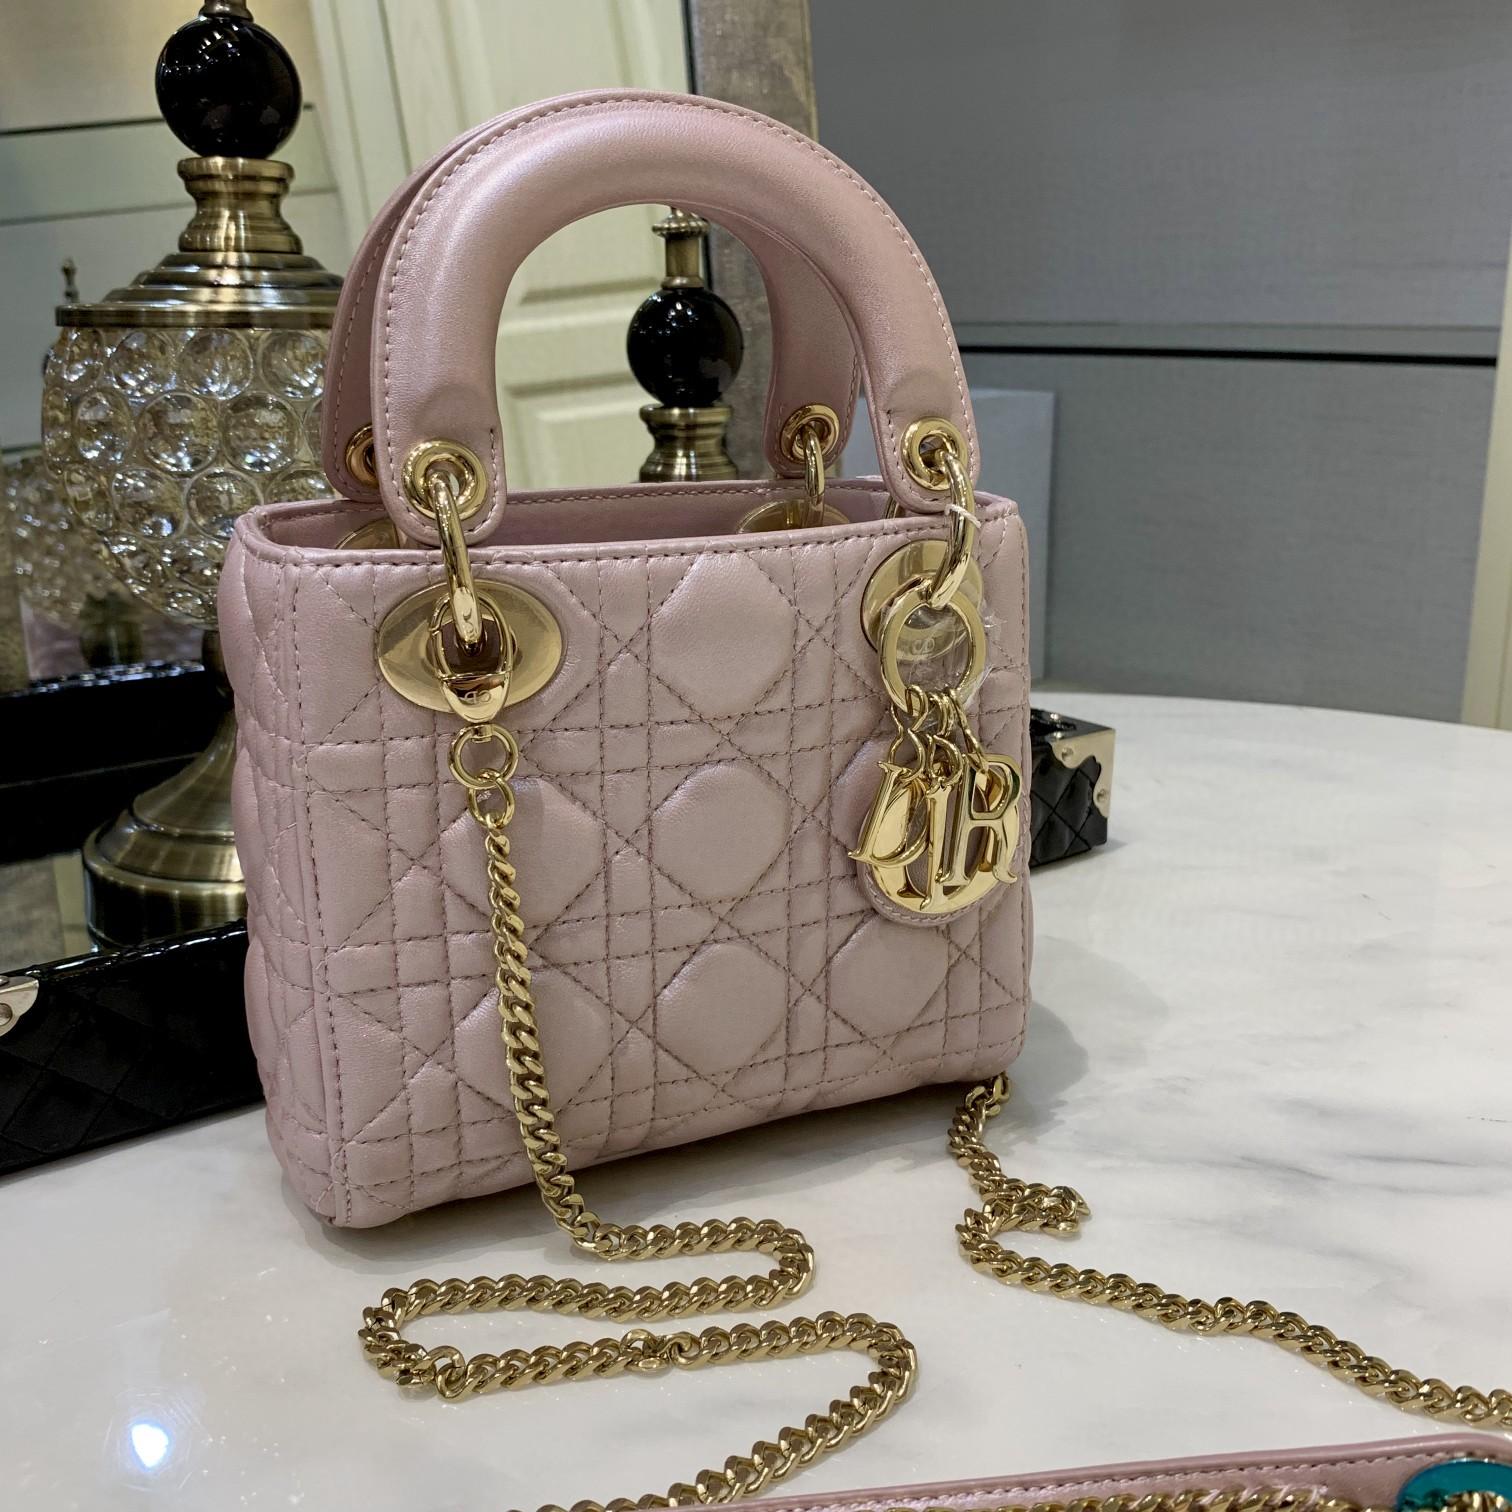 Lady 三格小羊皮 珠光粉 简单又仙女风 跟珠光灰一样并列最受欢迎的颜色行列 尺寸 17cm